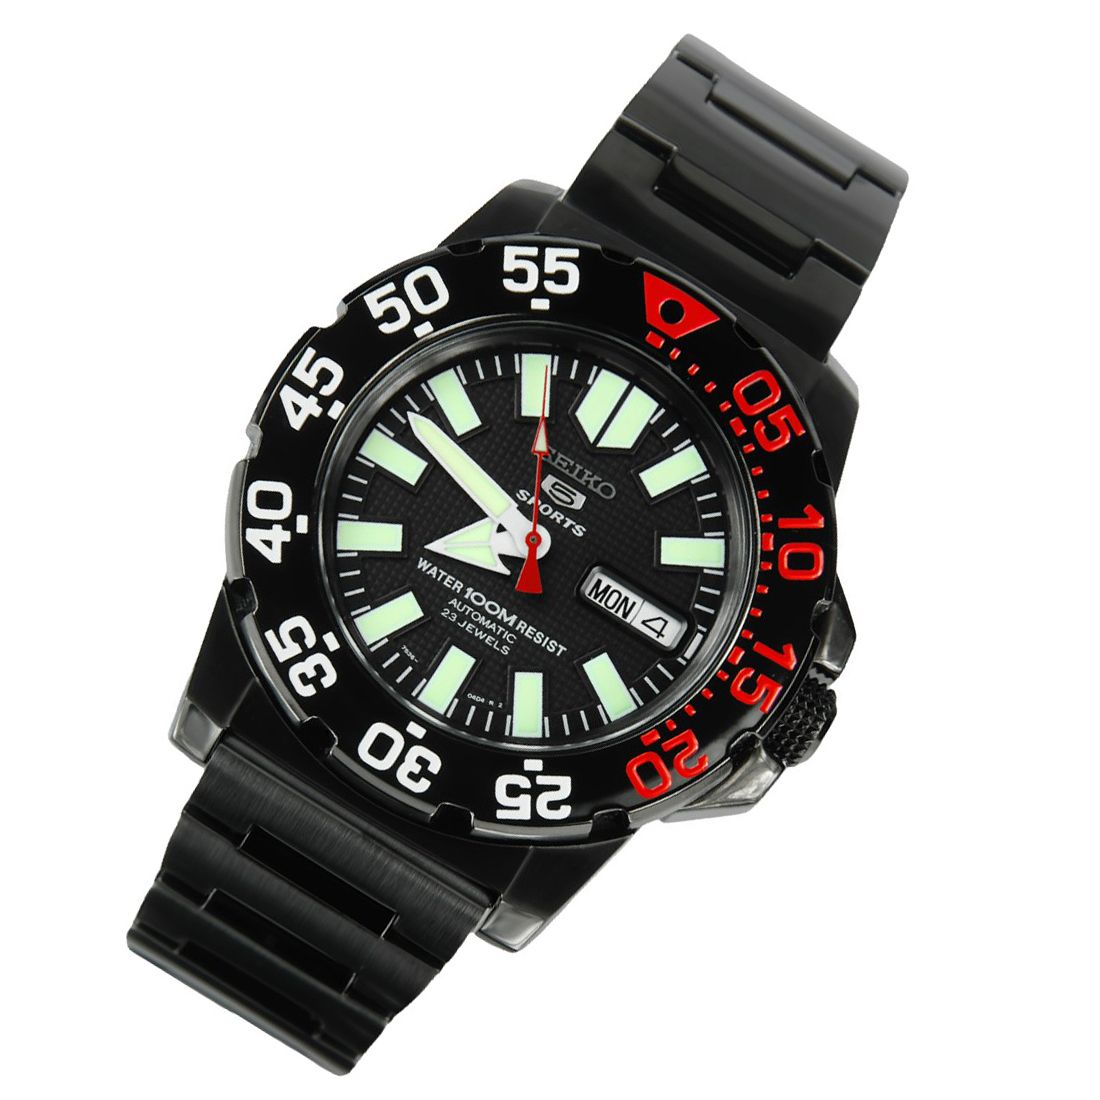 Seiko 5 Sports Automatic Divers Watch SNZF53K1 SNZF53